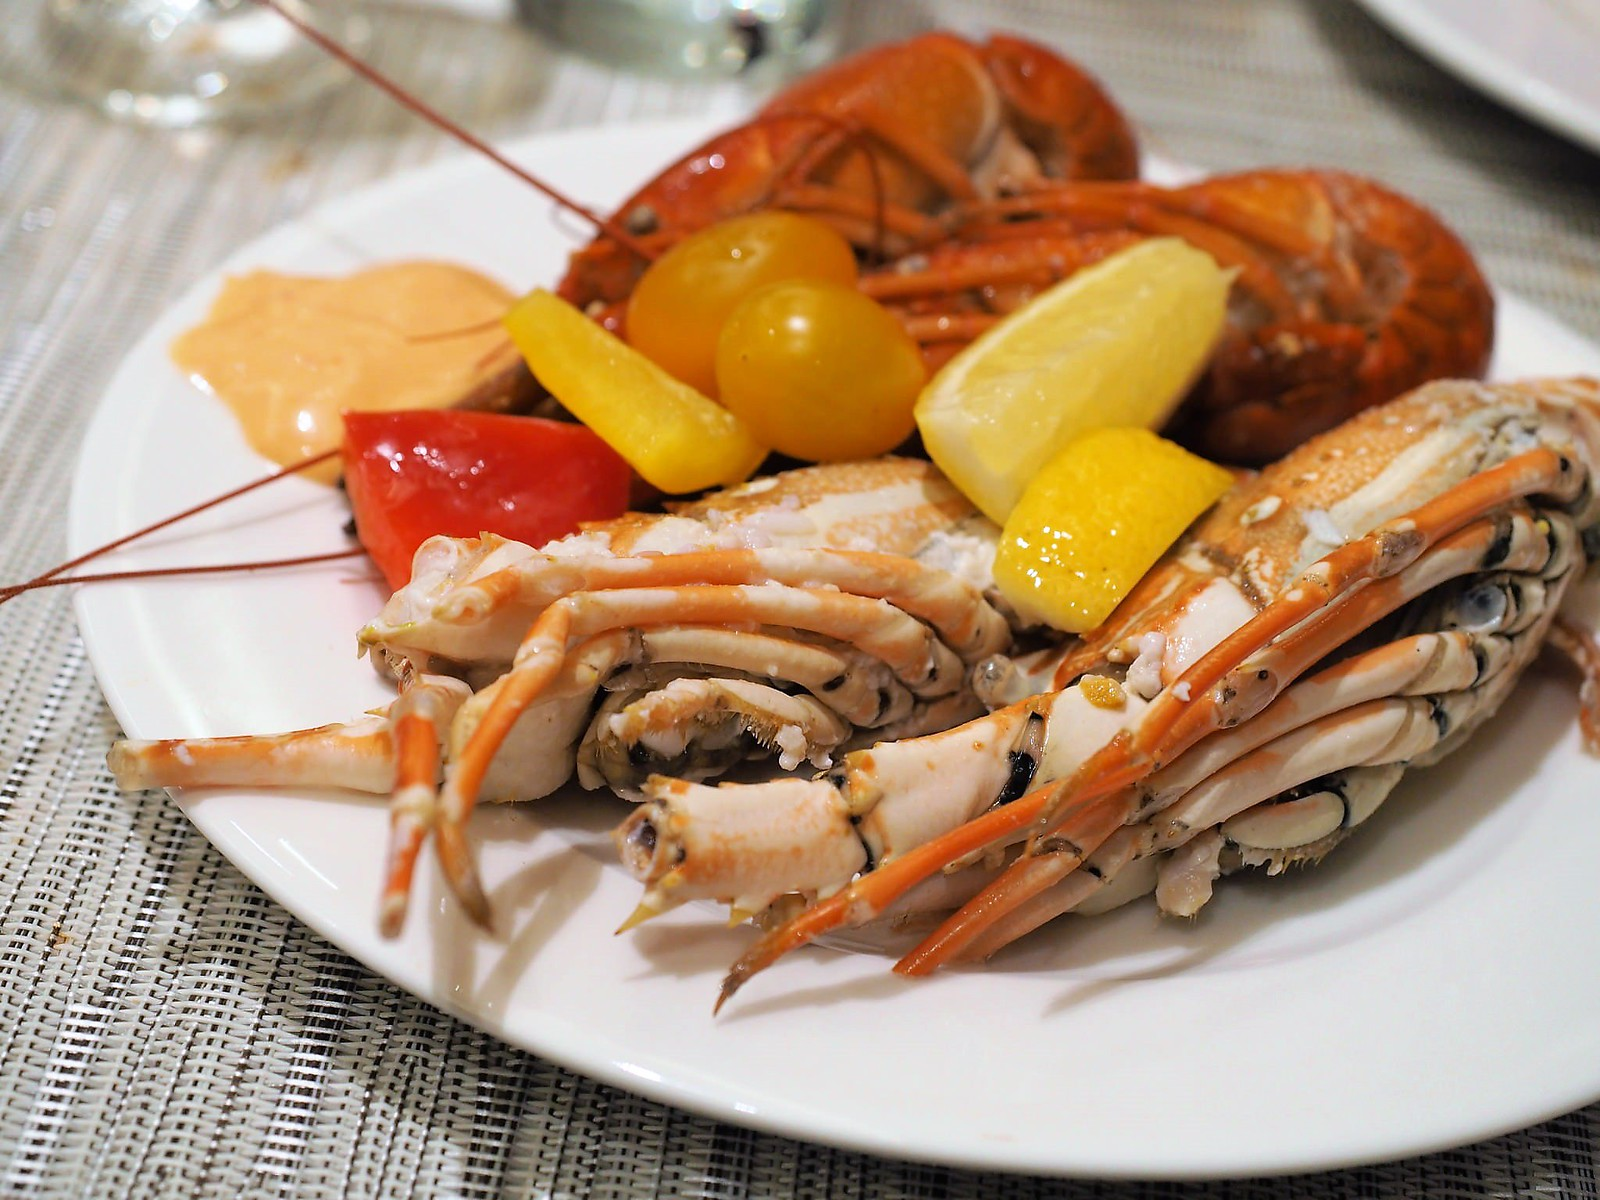 Baby lobster and yabby at Feast @ Sheraton Petaling Jaya